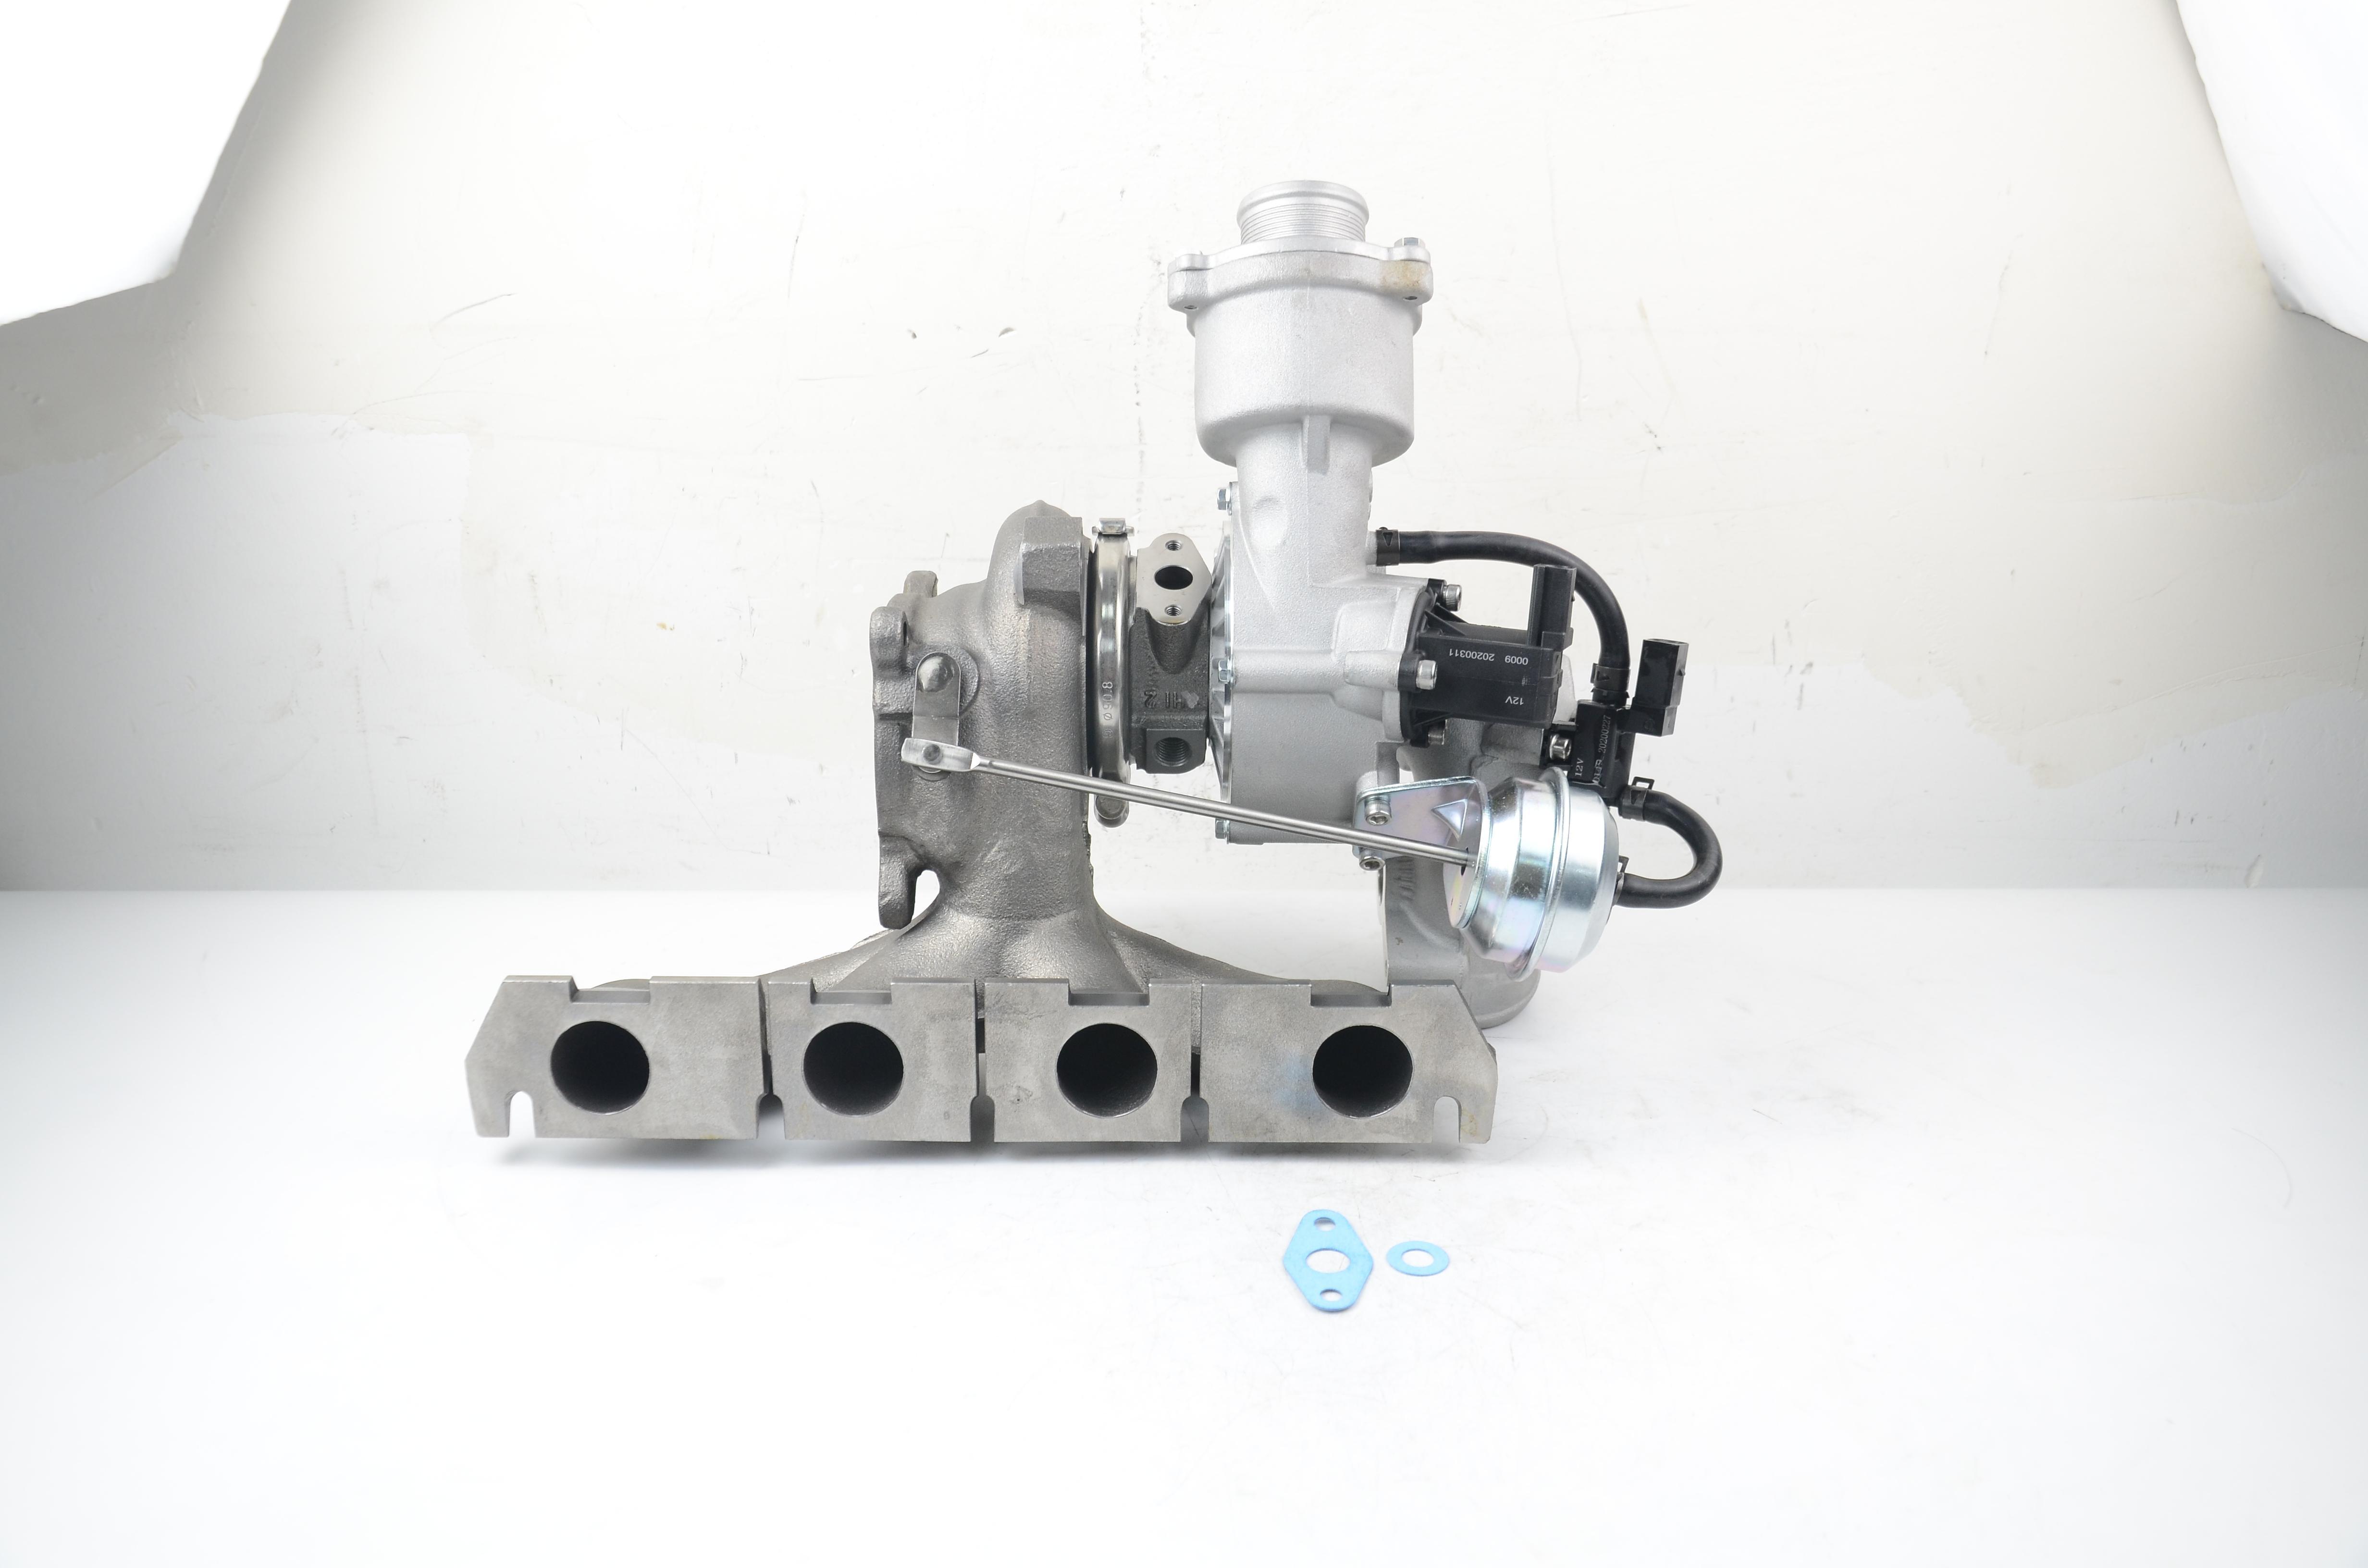 AP01 Turbo 06H145702G Voor Audi A4, A5, A6, S4, s5 2.0L 2009-2017 06H145701EV Cdnb, Cdnc, Caea, Caeb, Cfka, Tfsi